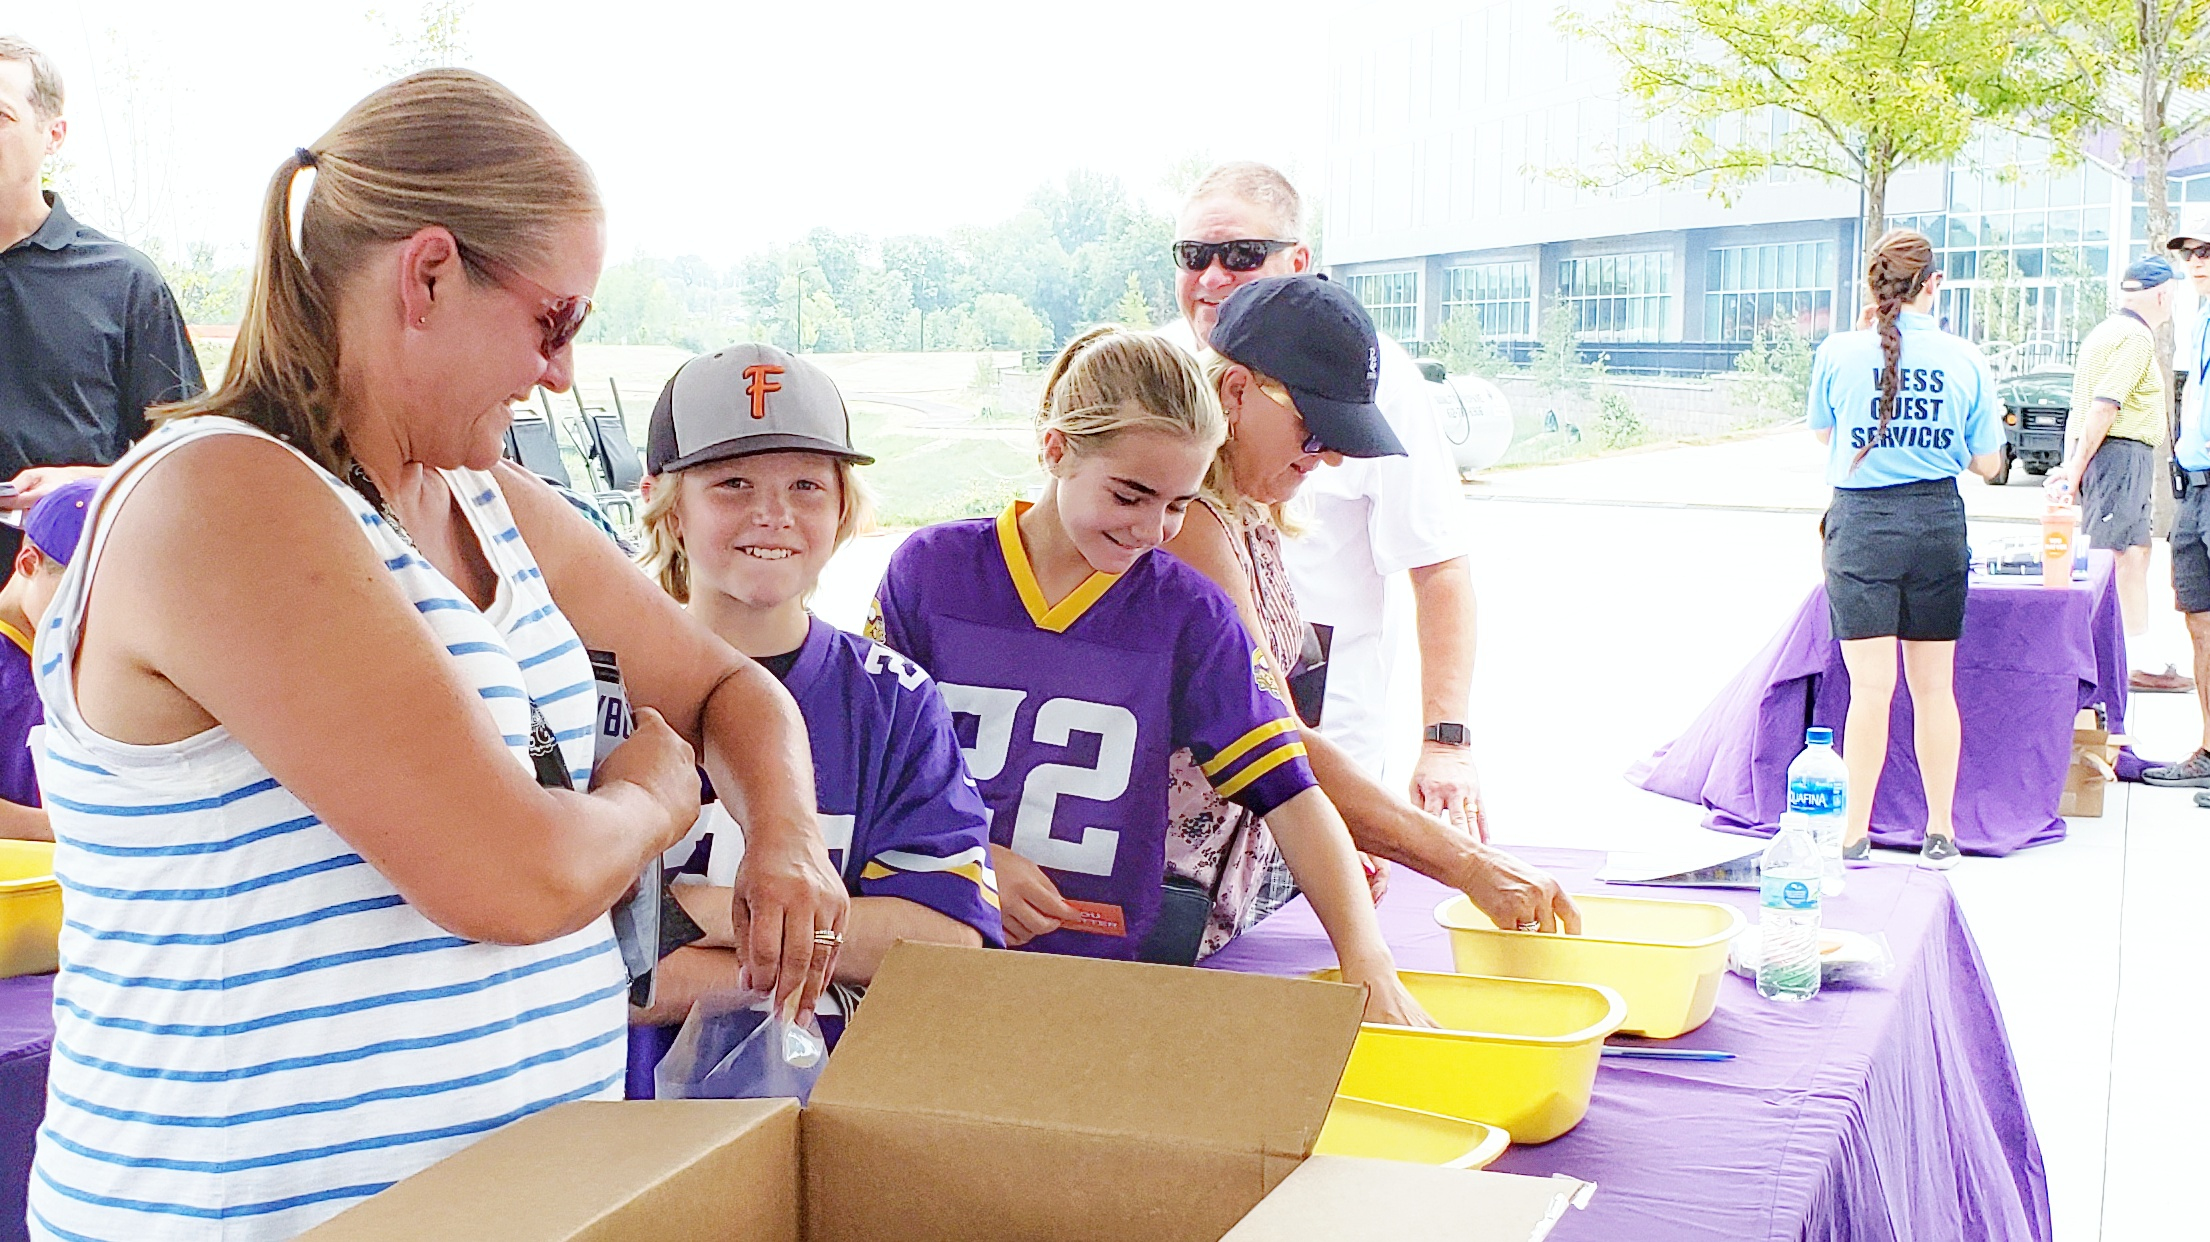 Vikings fans packing MATTERbox snack packs